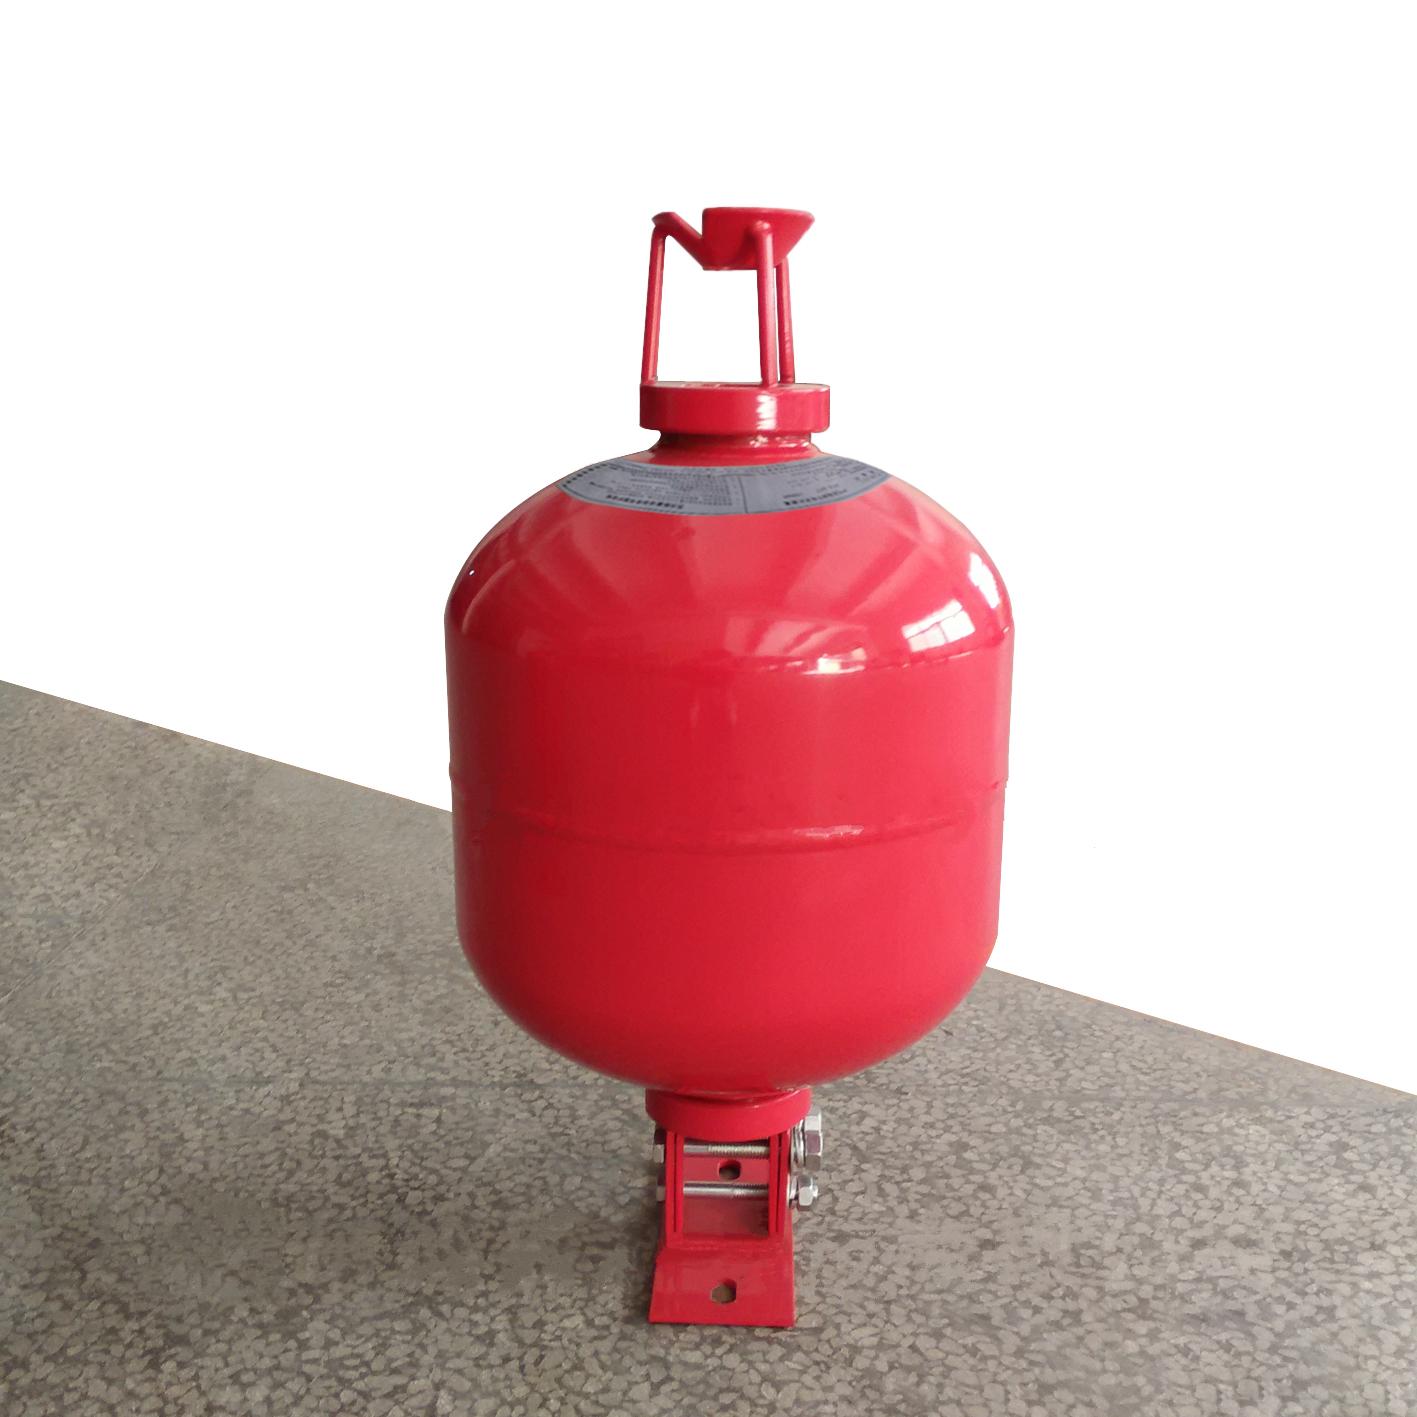 Hanging superfine dry powder fire extinguishing device (non-storage type)